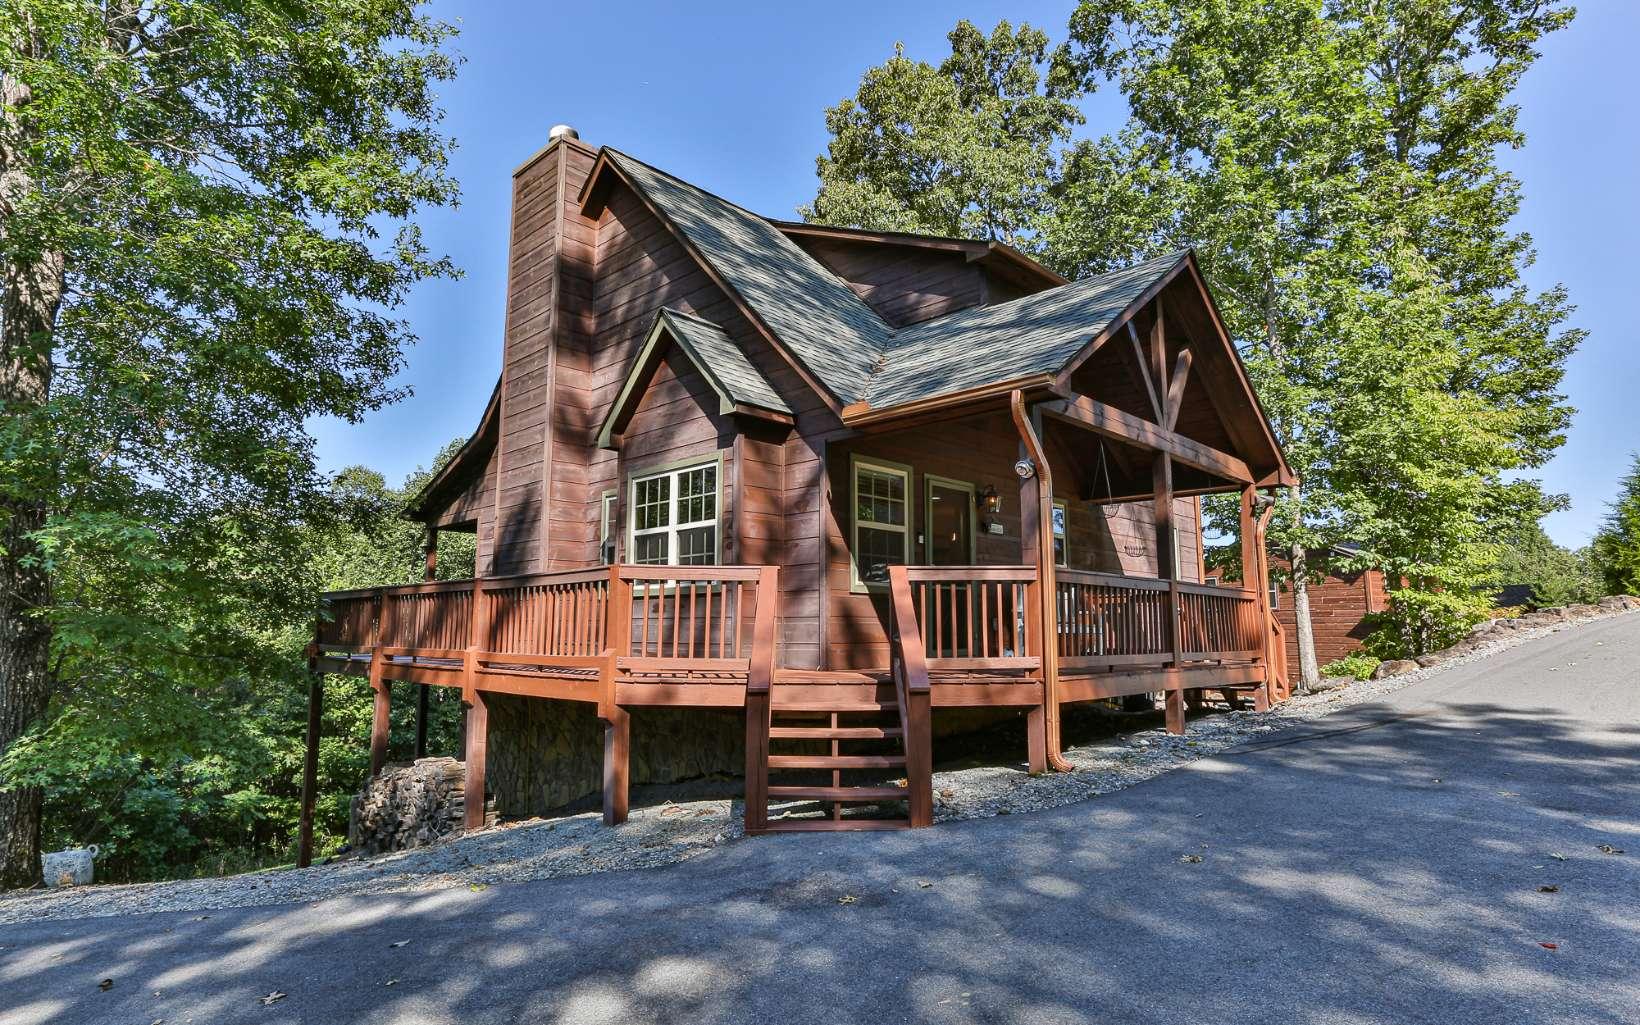 Homes for sale in Hiawassee, GA | North Georgia Mountain